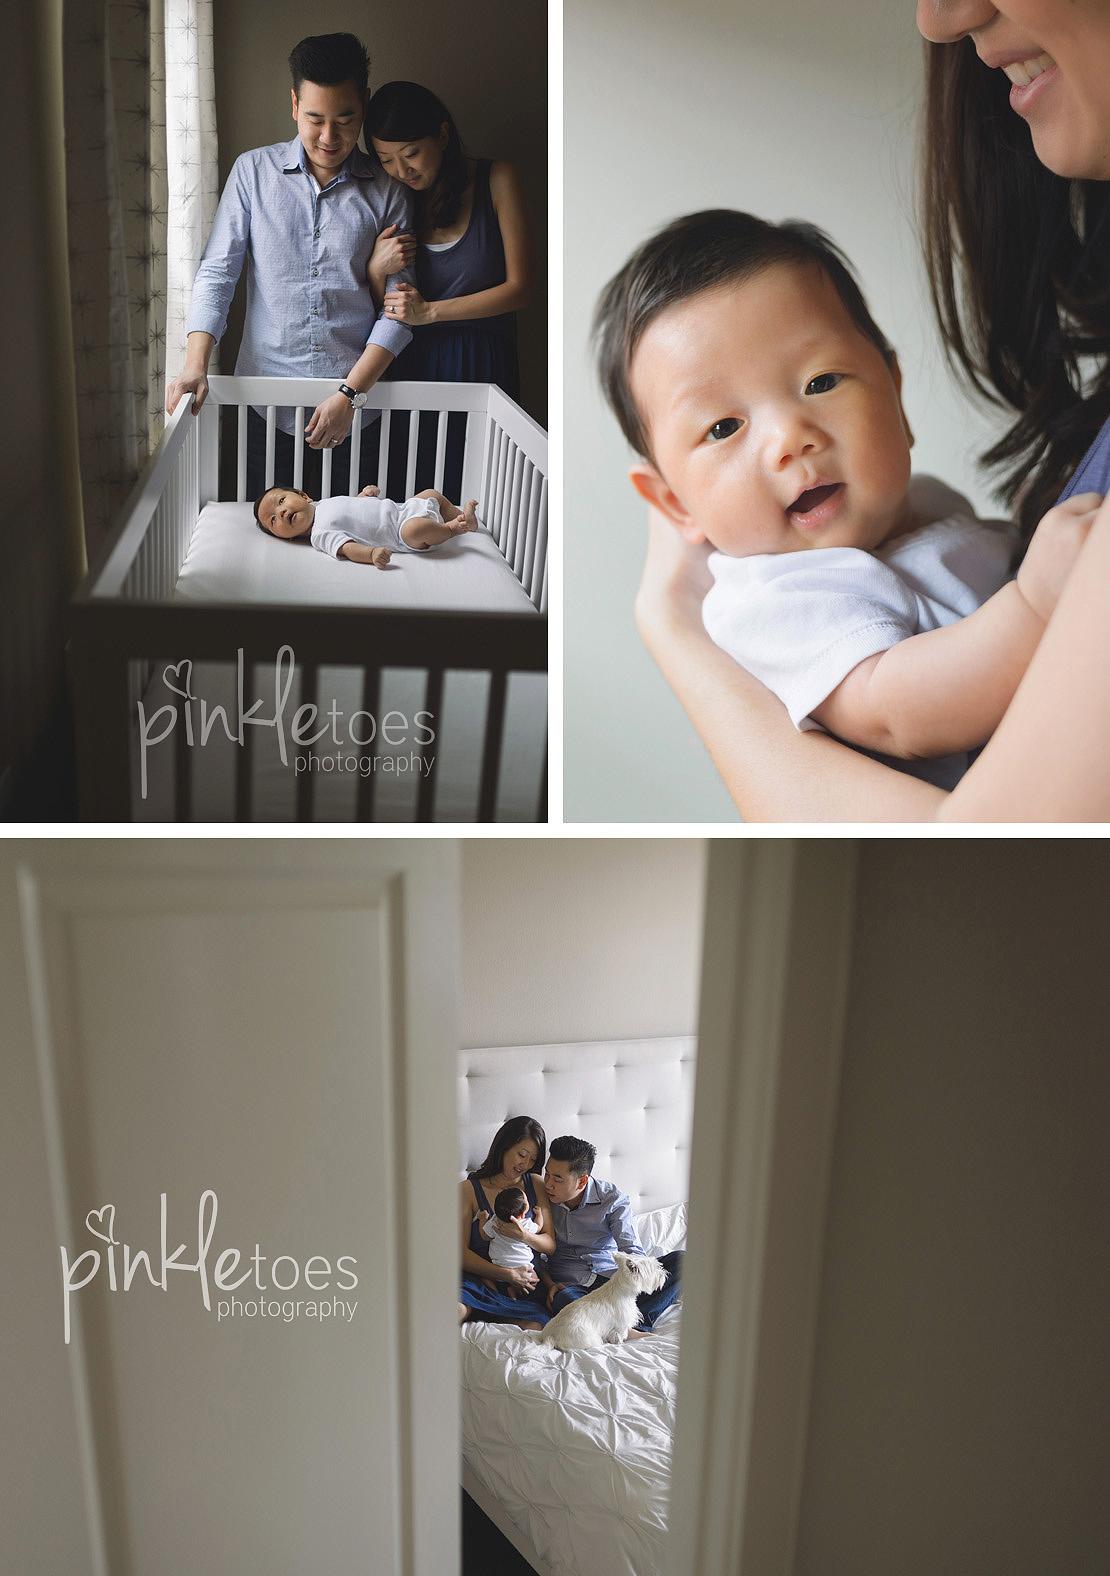 austin-natural-lifestyle-newborn-baby-photography-24a